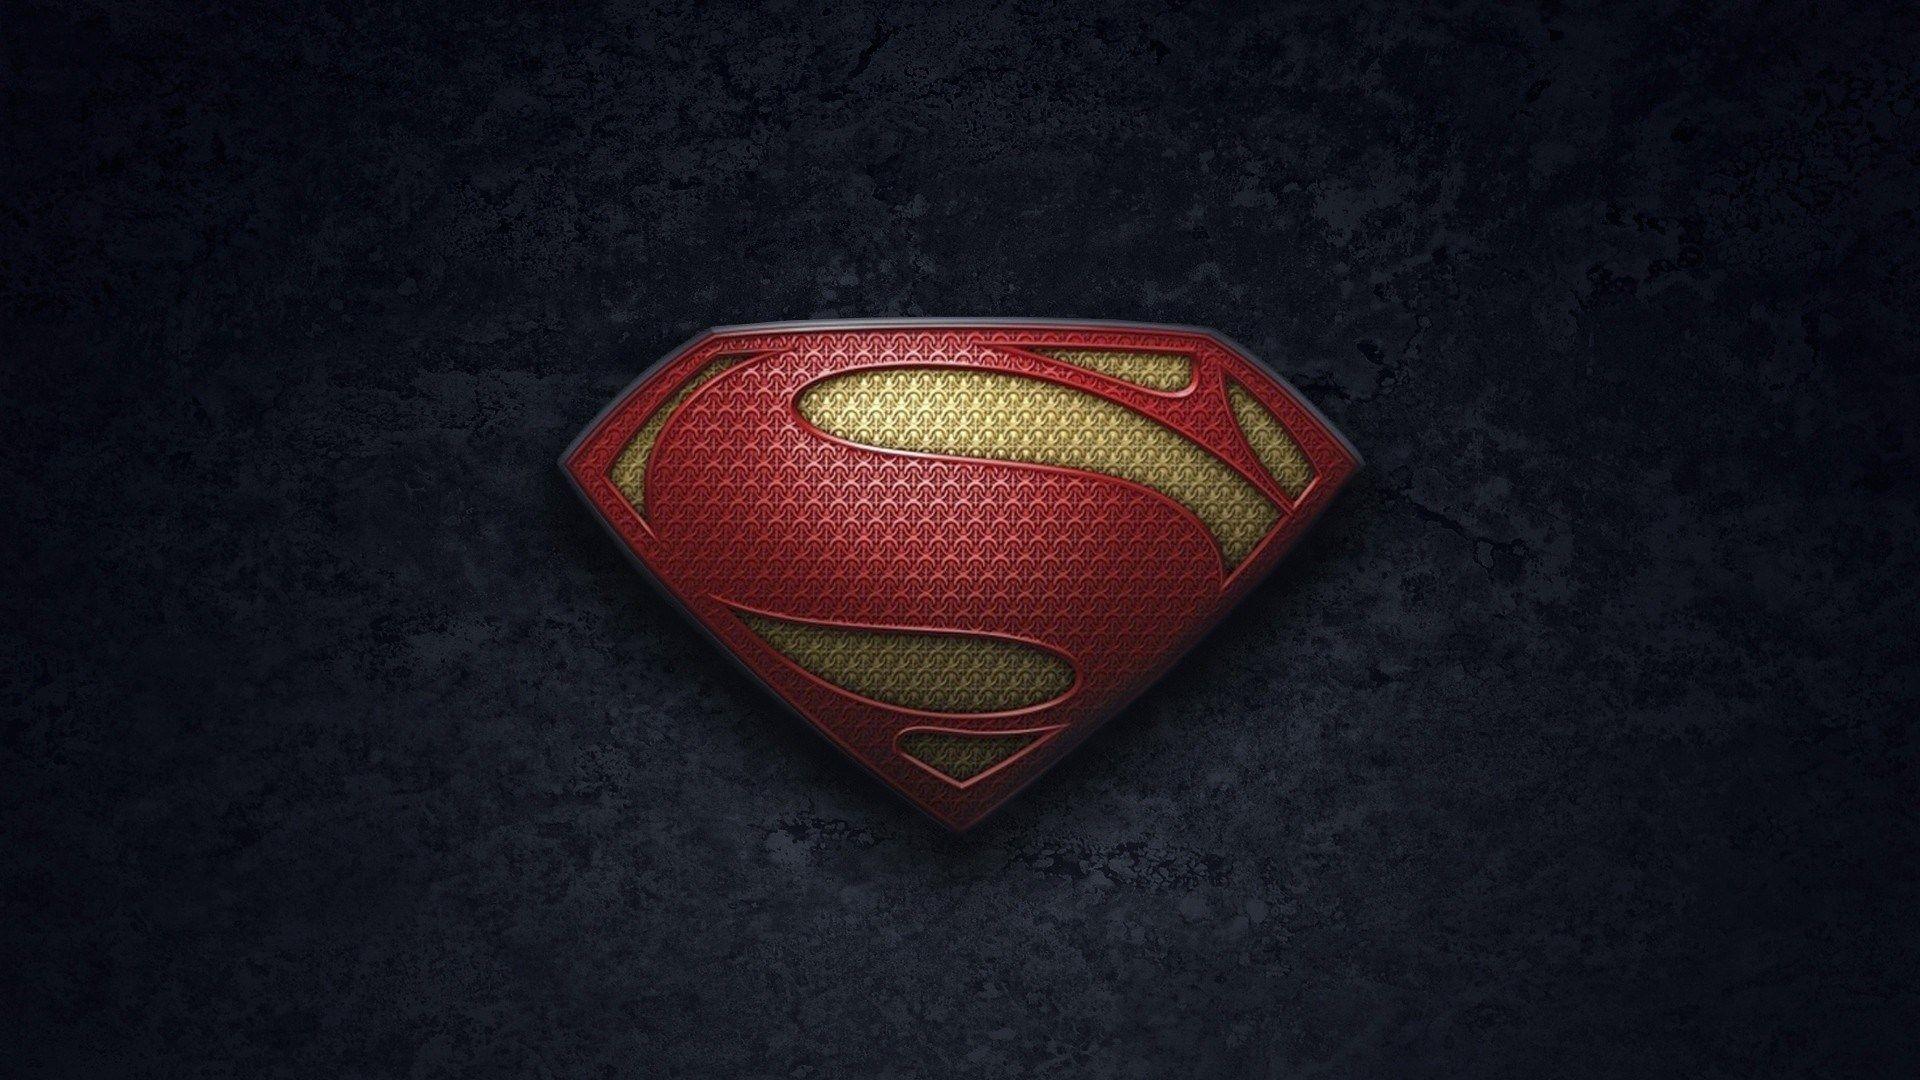 Wallpaper iphone superman – Batman Vs Superman Dawn Of Justice Iphone  Desktop 1920 1440 Superman Image